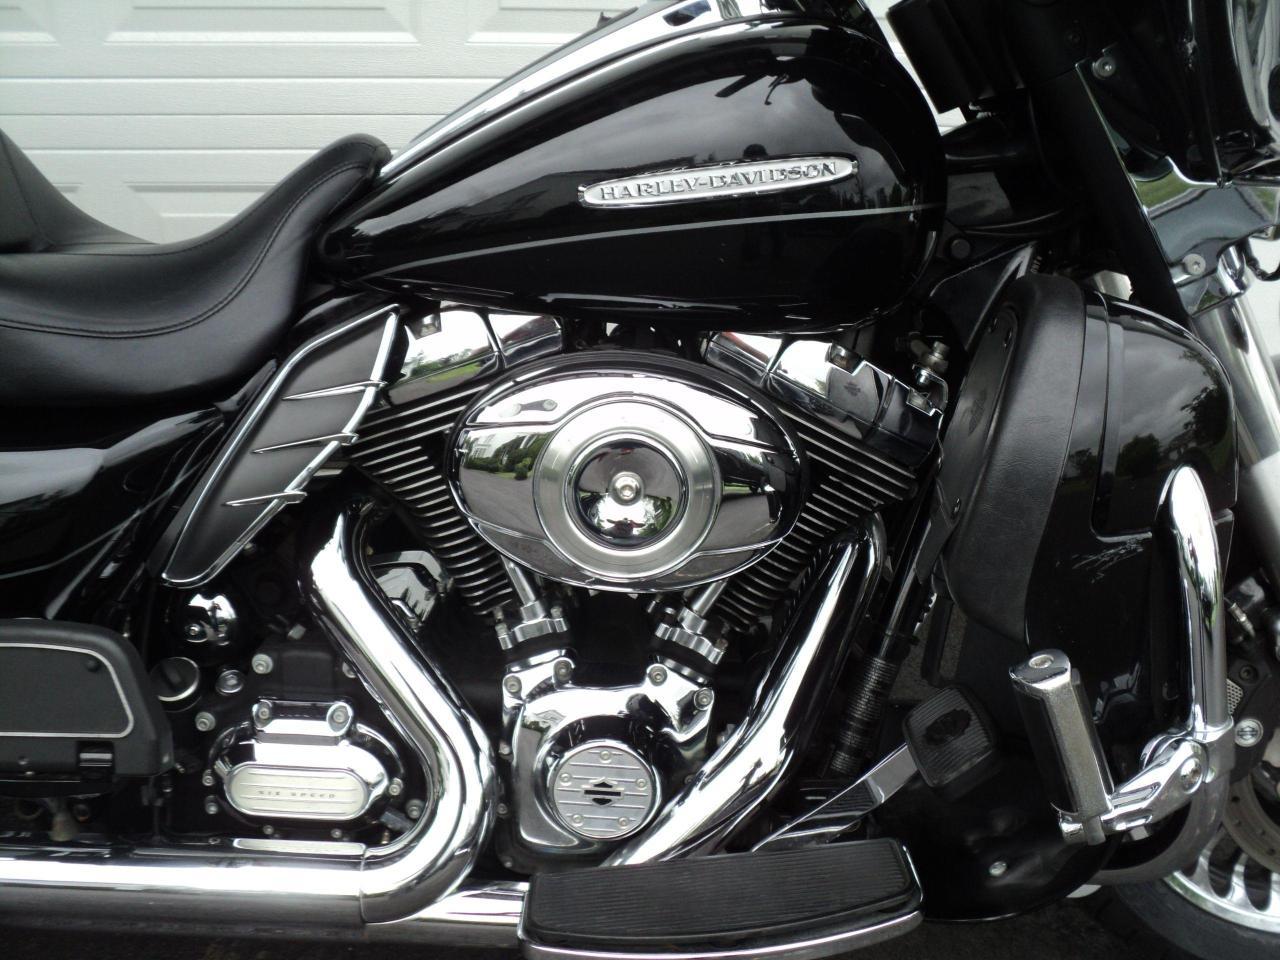 2012 Harley-Davidson Ultra